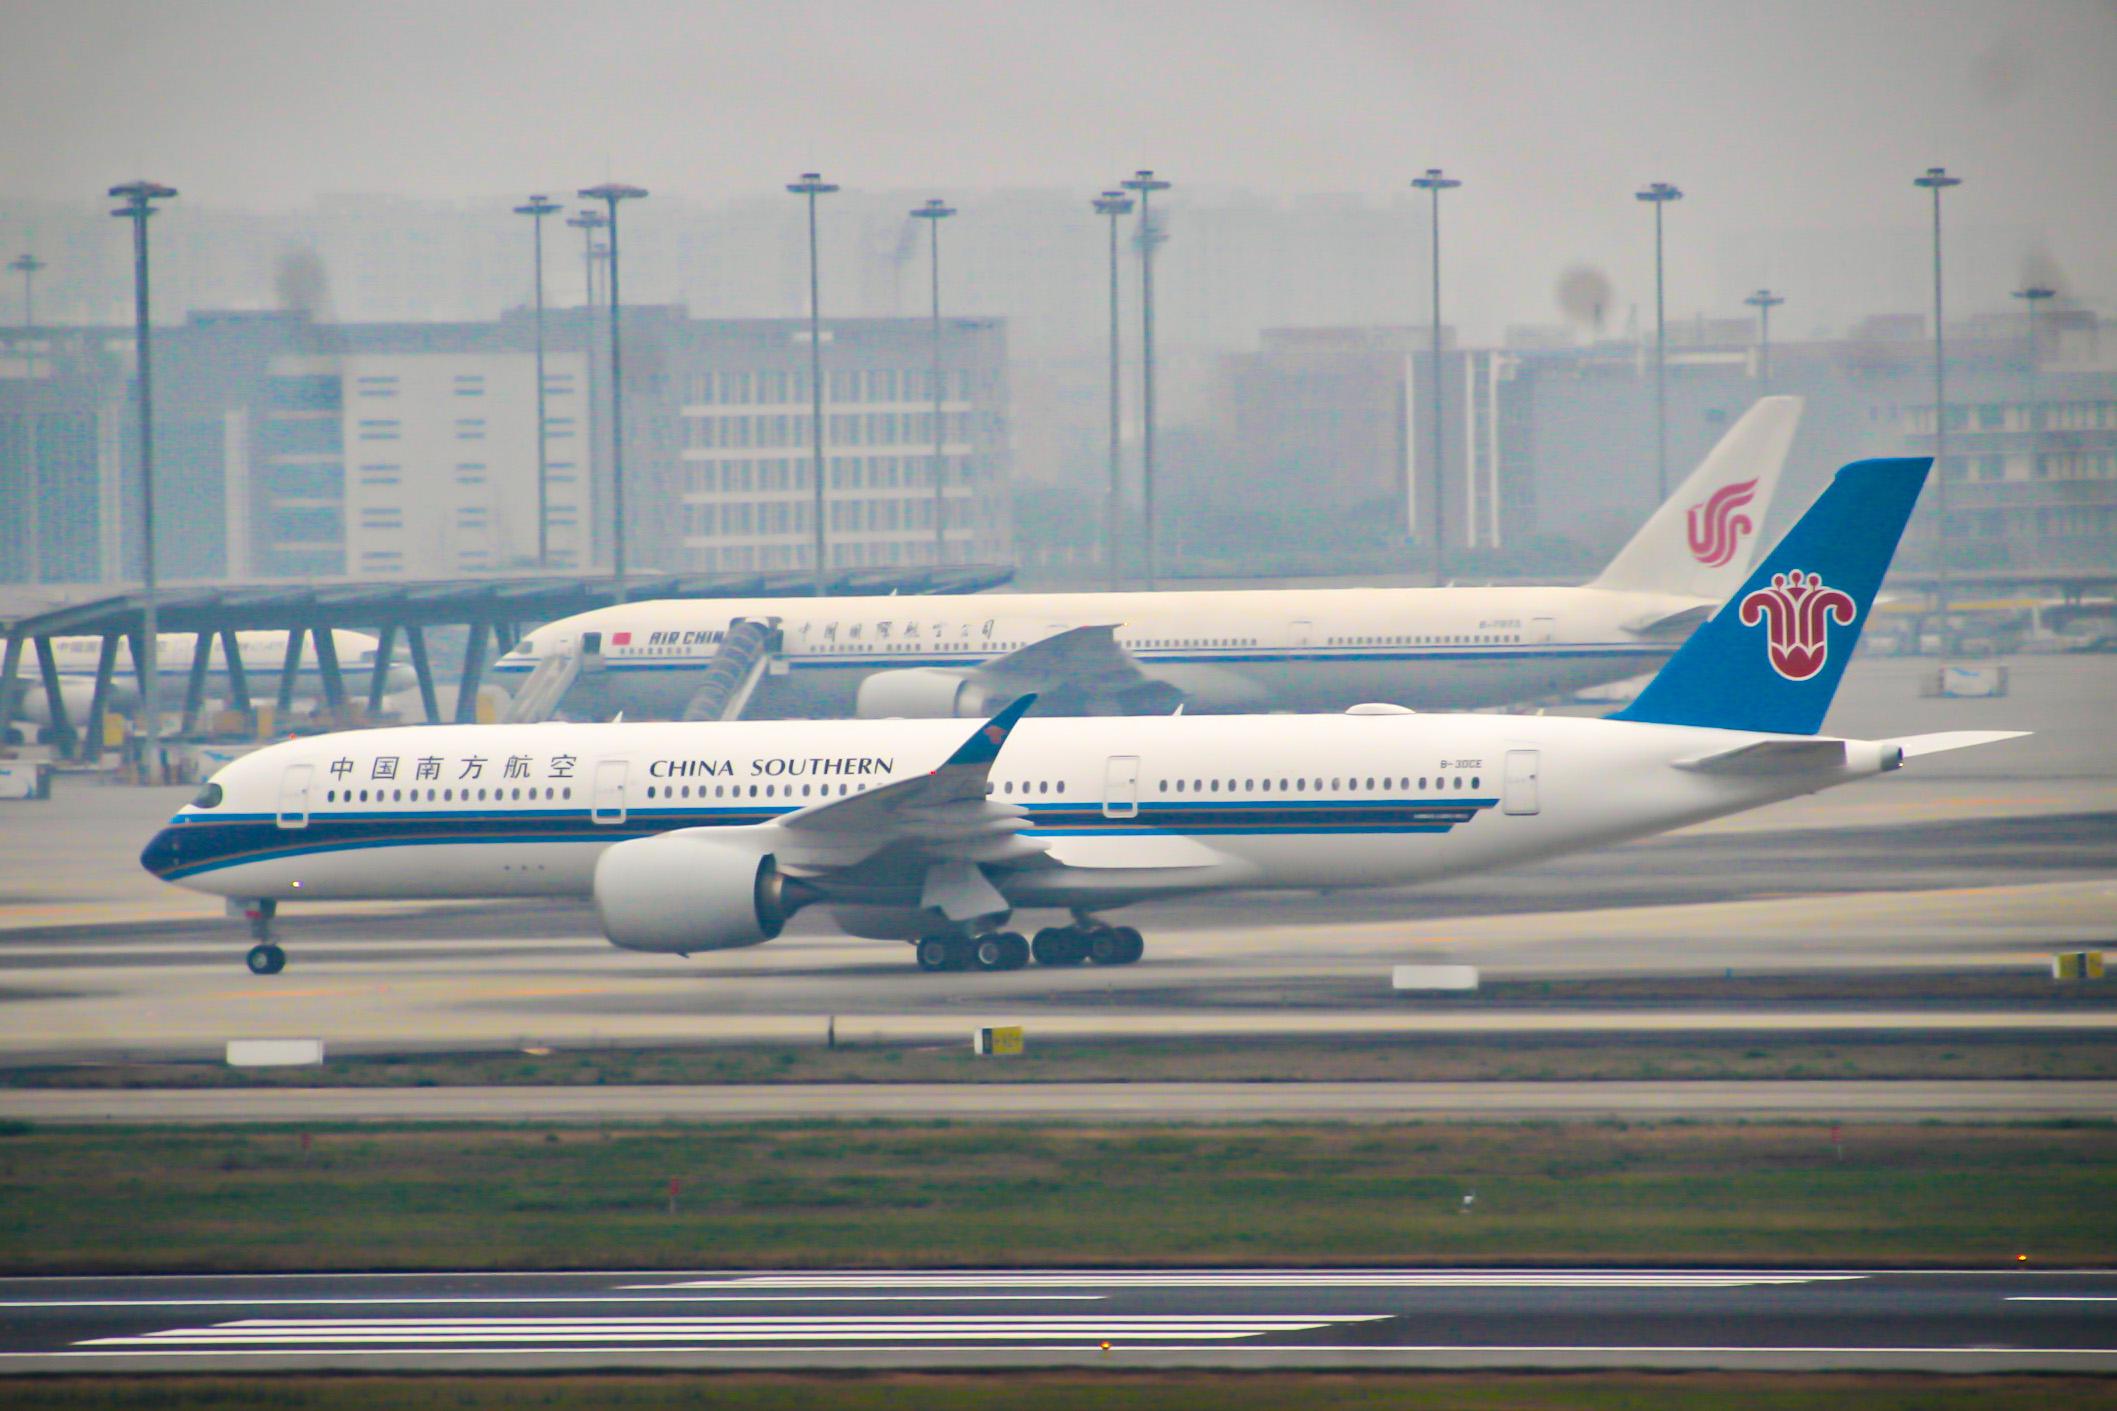 Re:[原创]CTU水泥天拍机,验证烂天好货的铁律 AIRBUS A350-900 B-30CE 中国成都双流国际机场